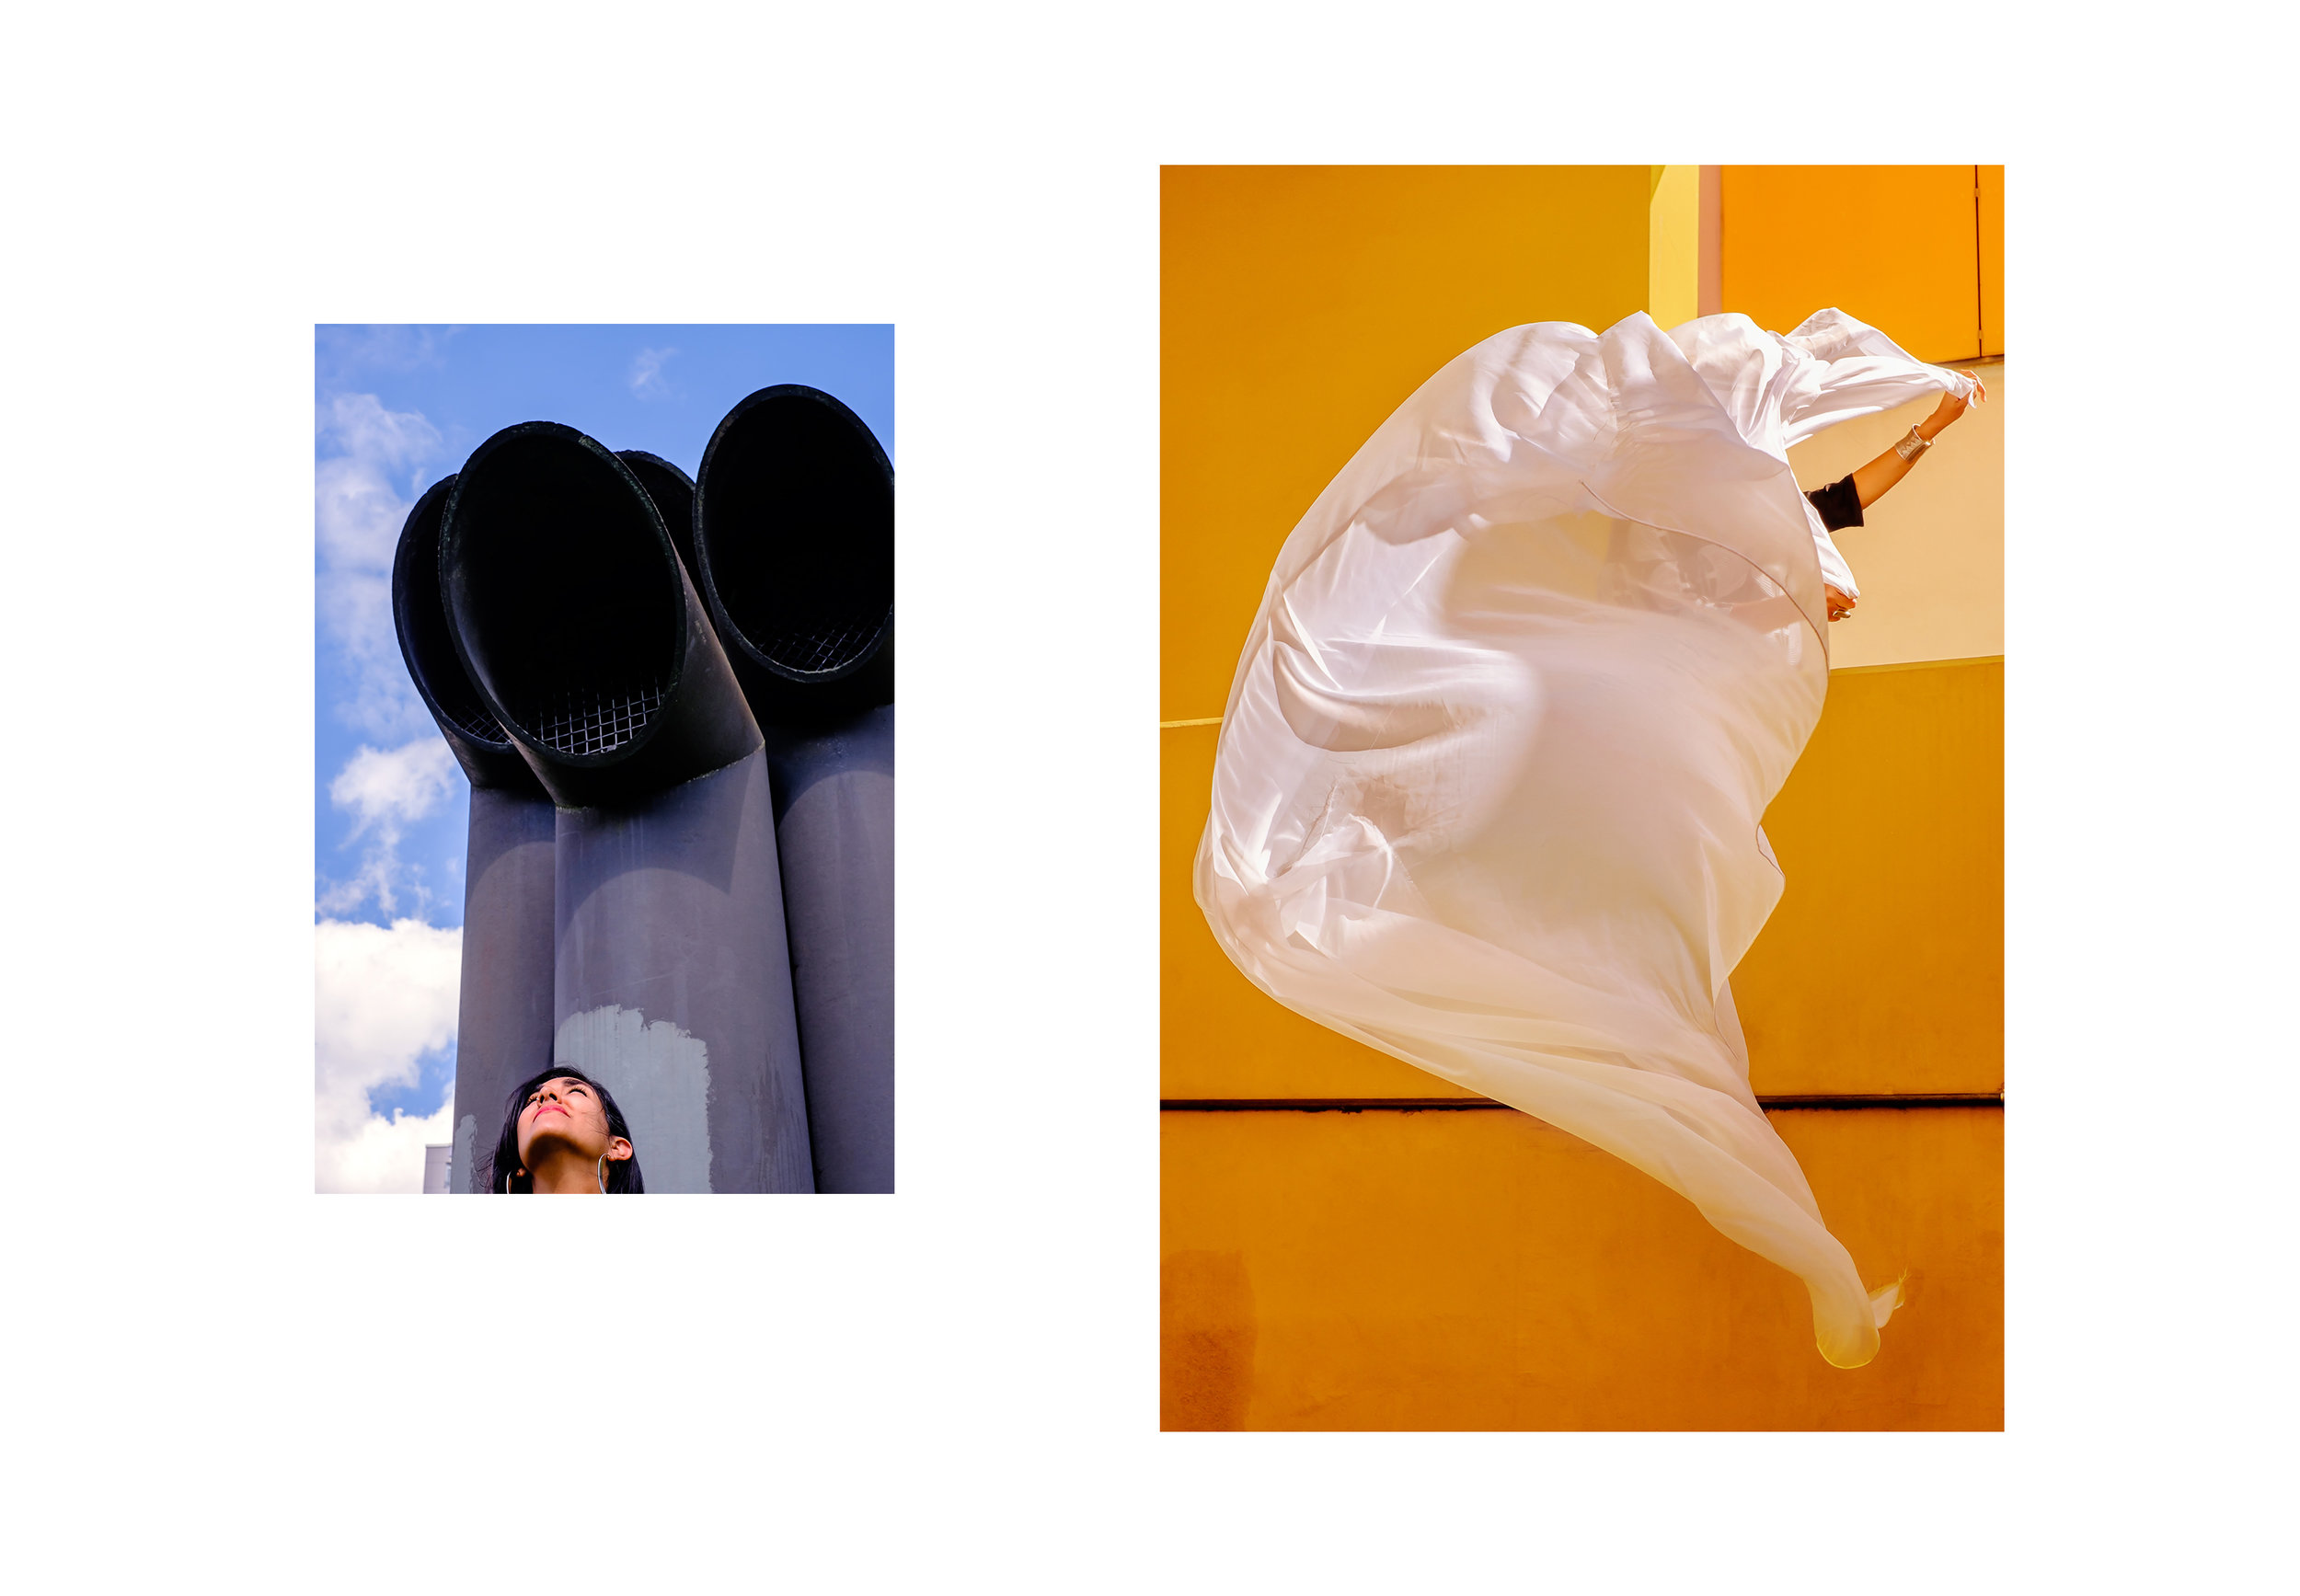 Heba-Amin-Portrait-Panta-Magazine-Matthew-Coleman-Photography-1.jpg